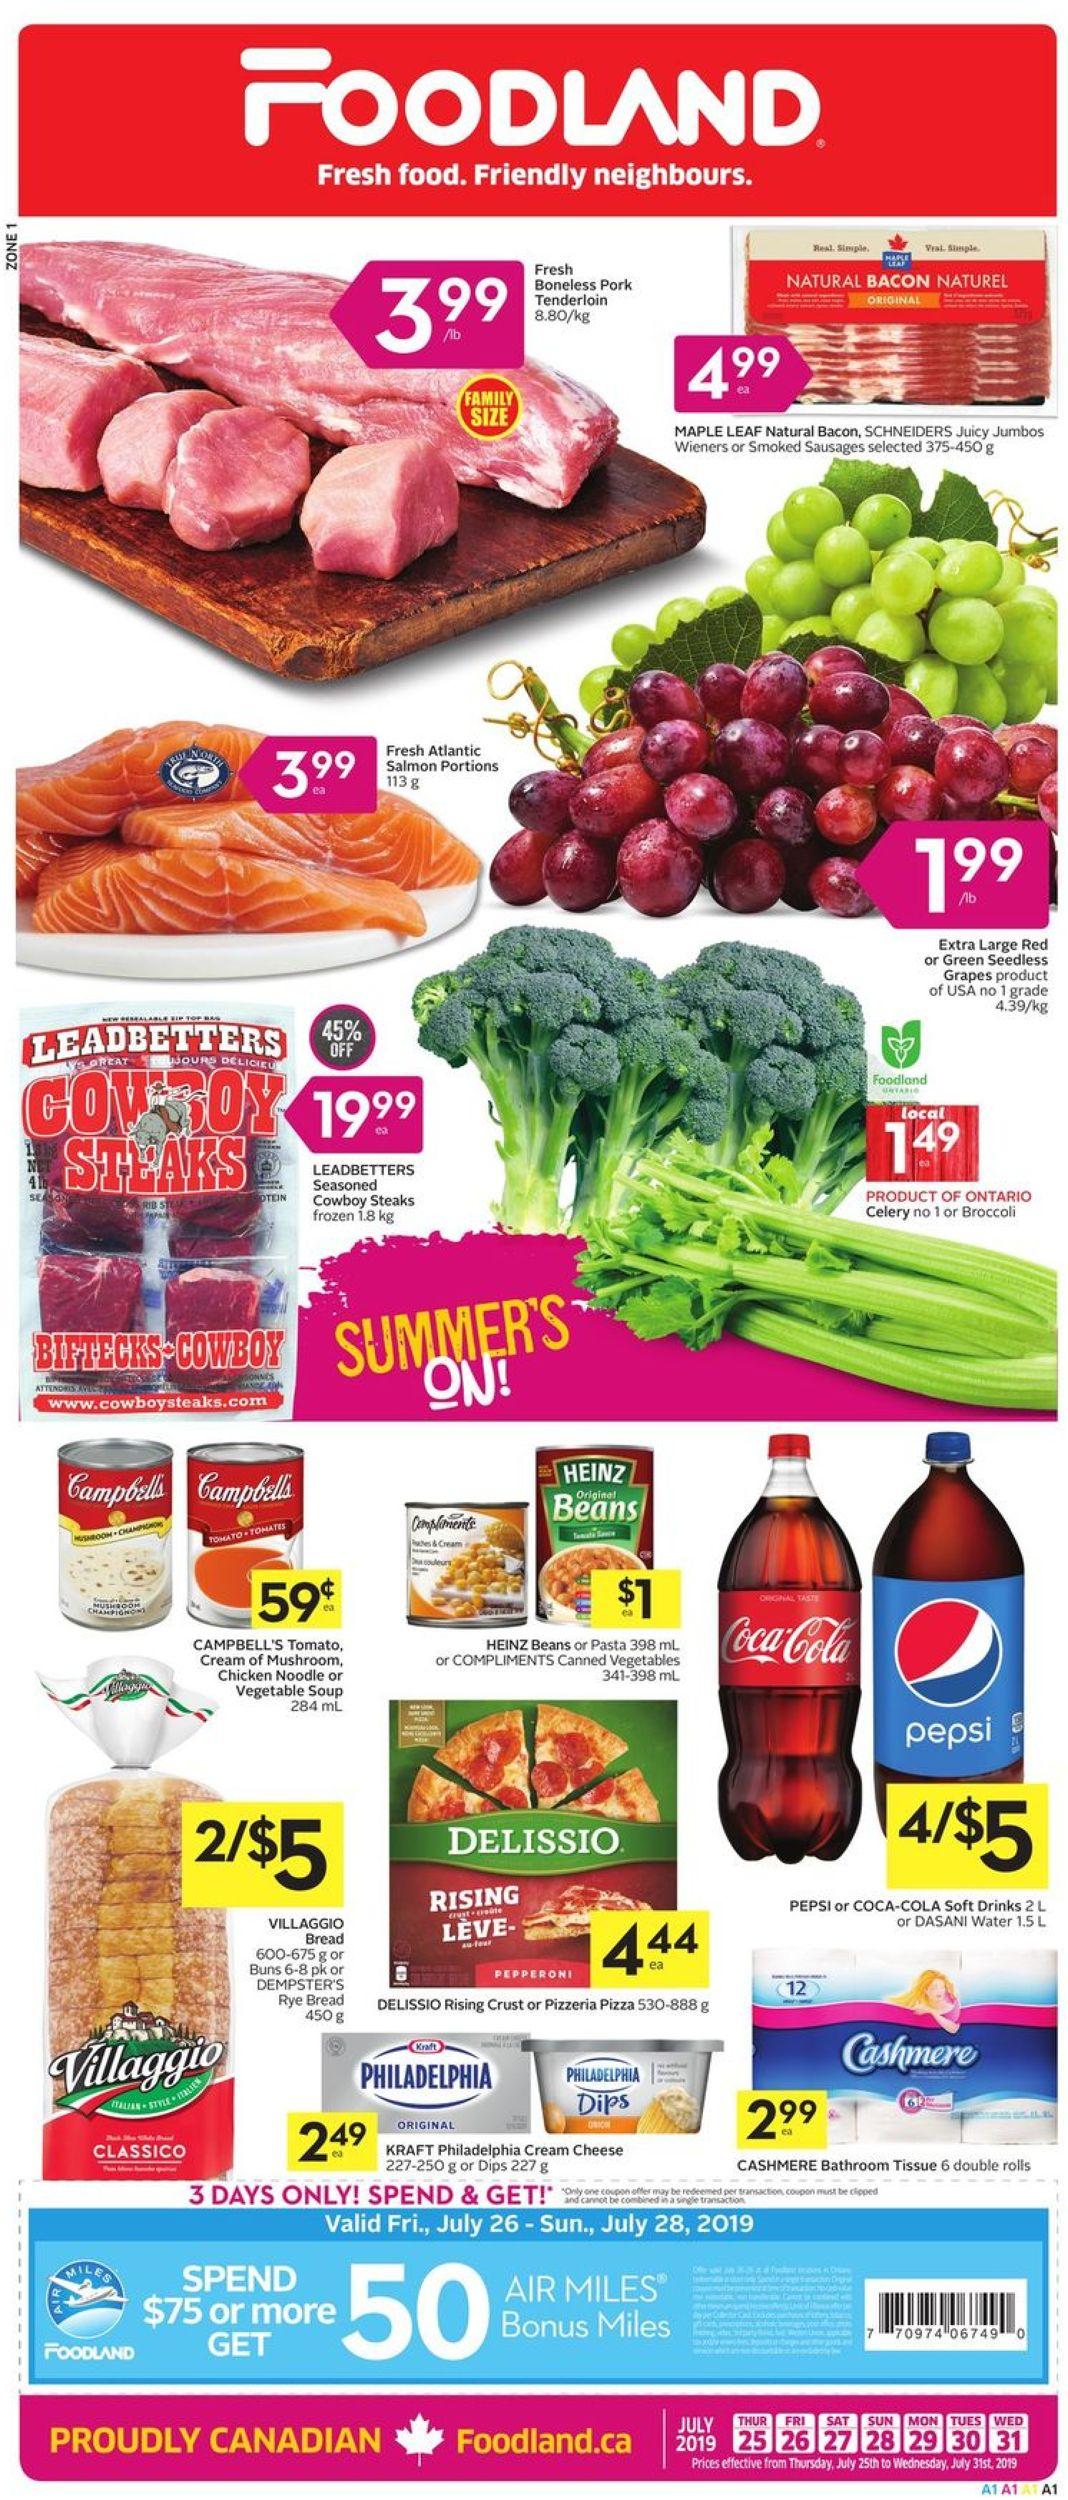 Foodland Flyer - 07/25-07/31/2019